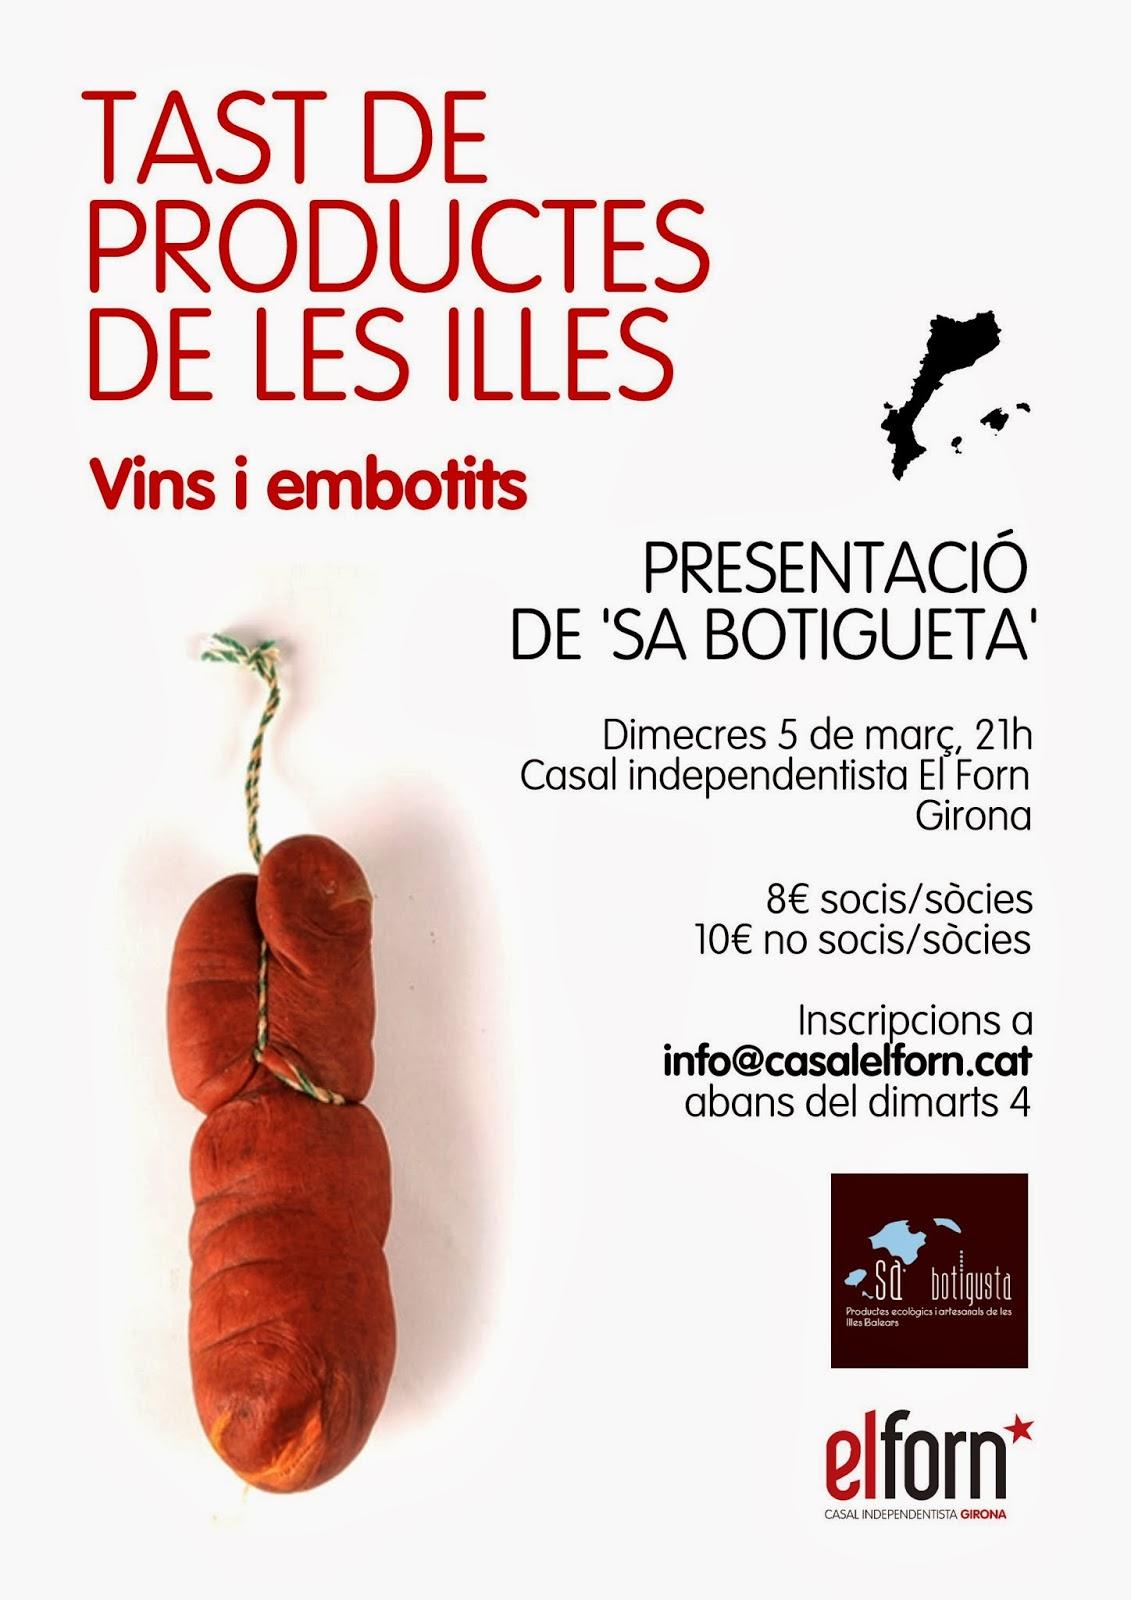 Casal Independentista El Forn Girona